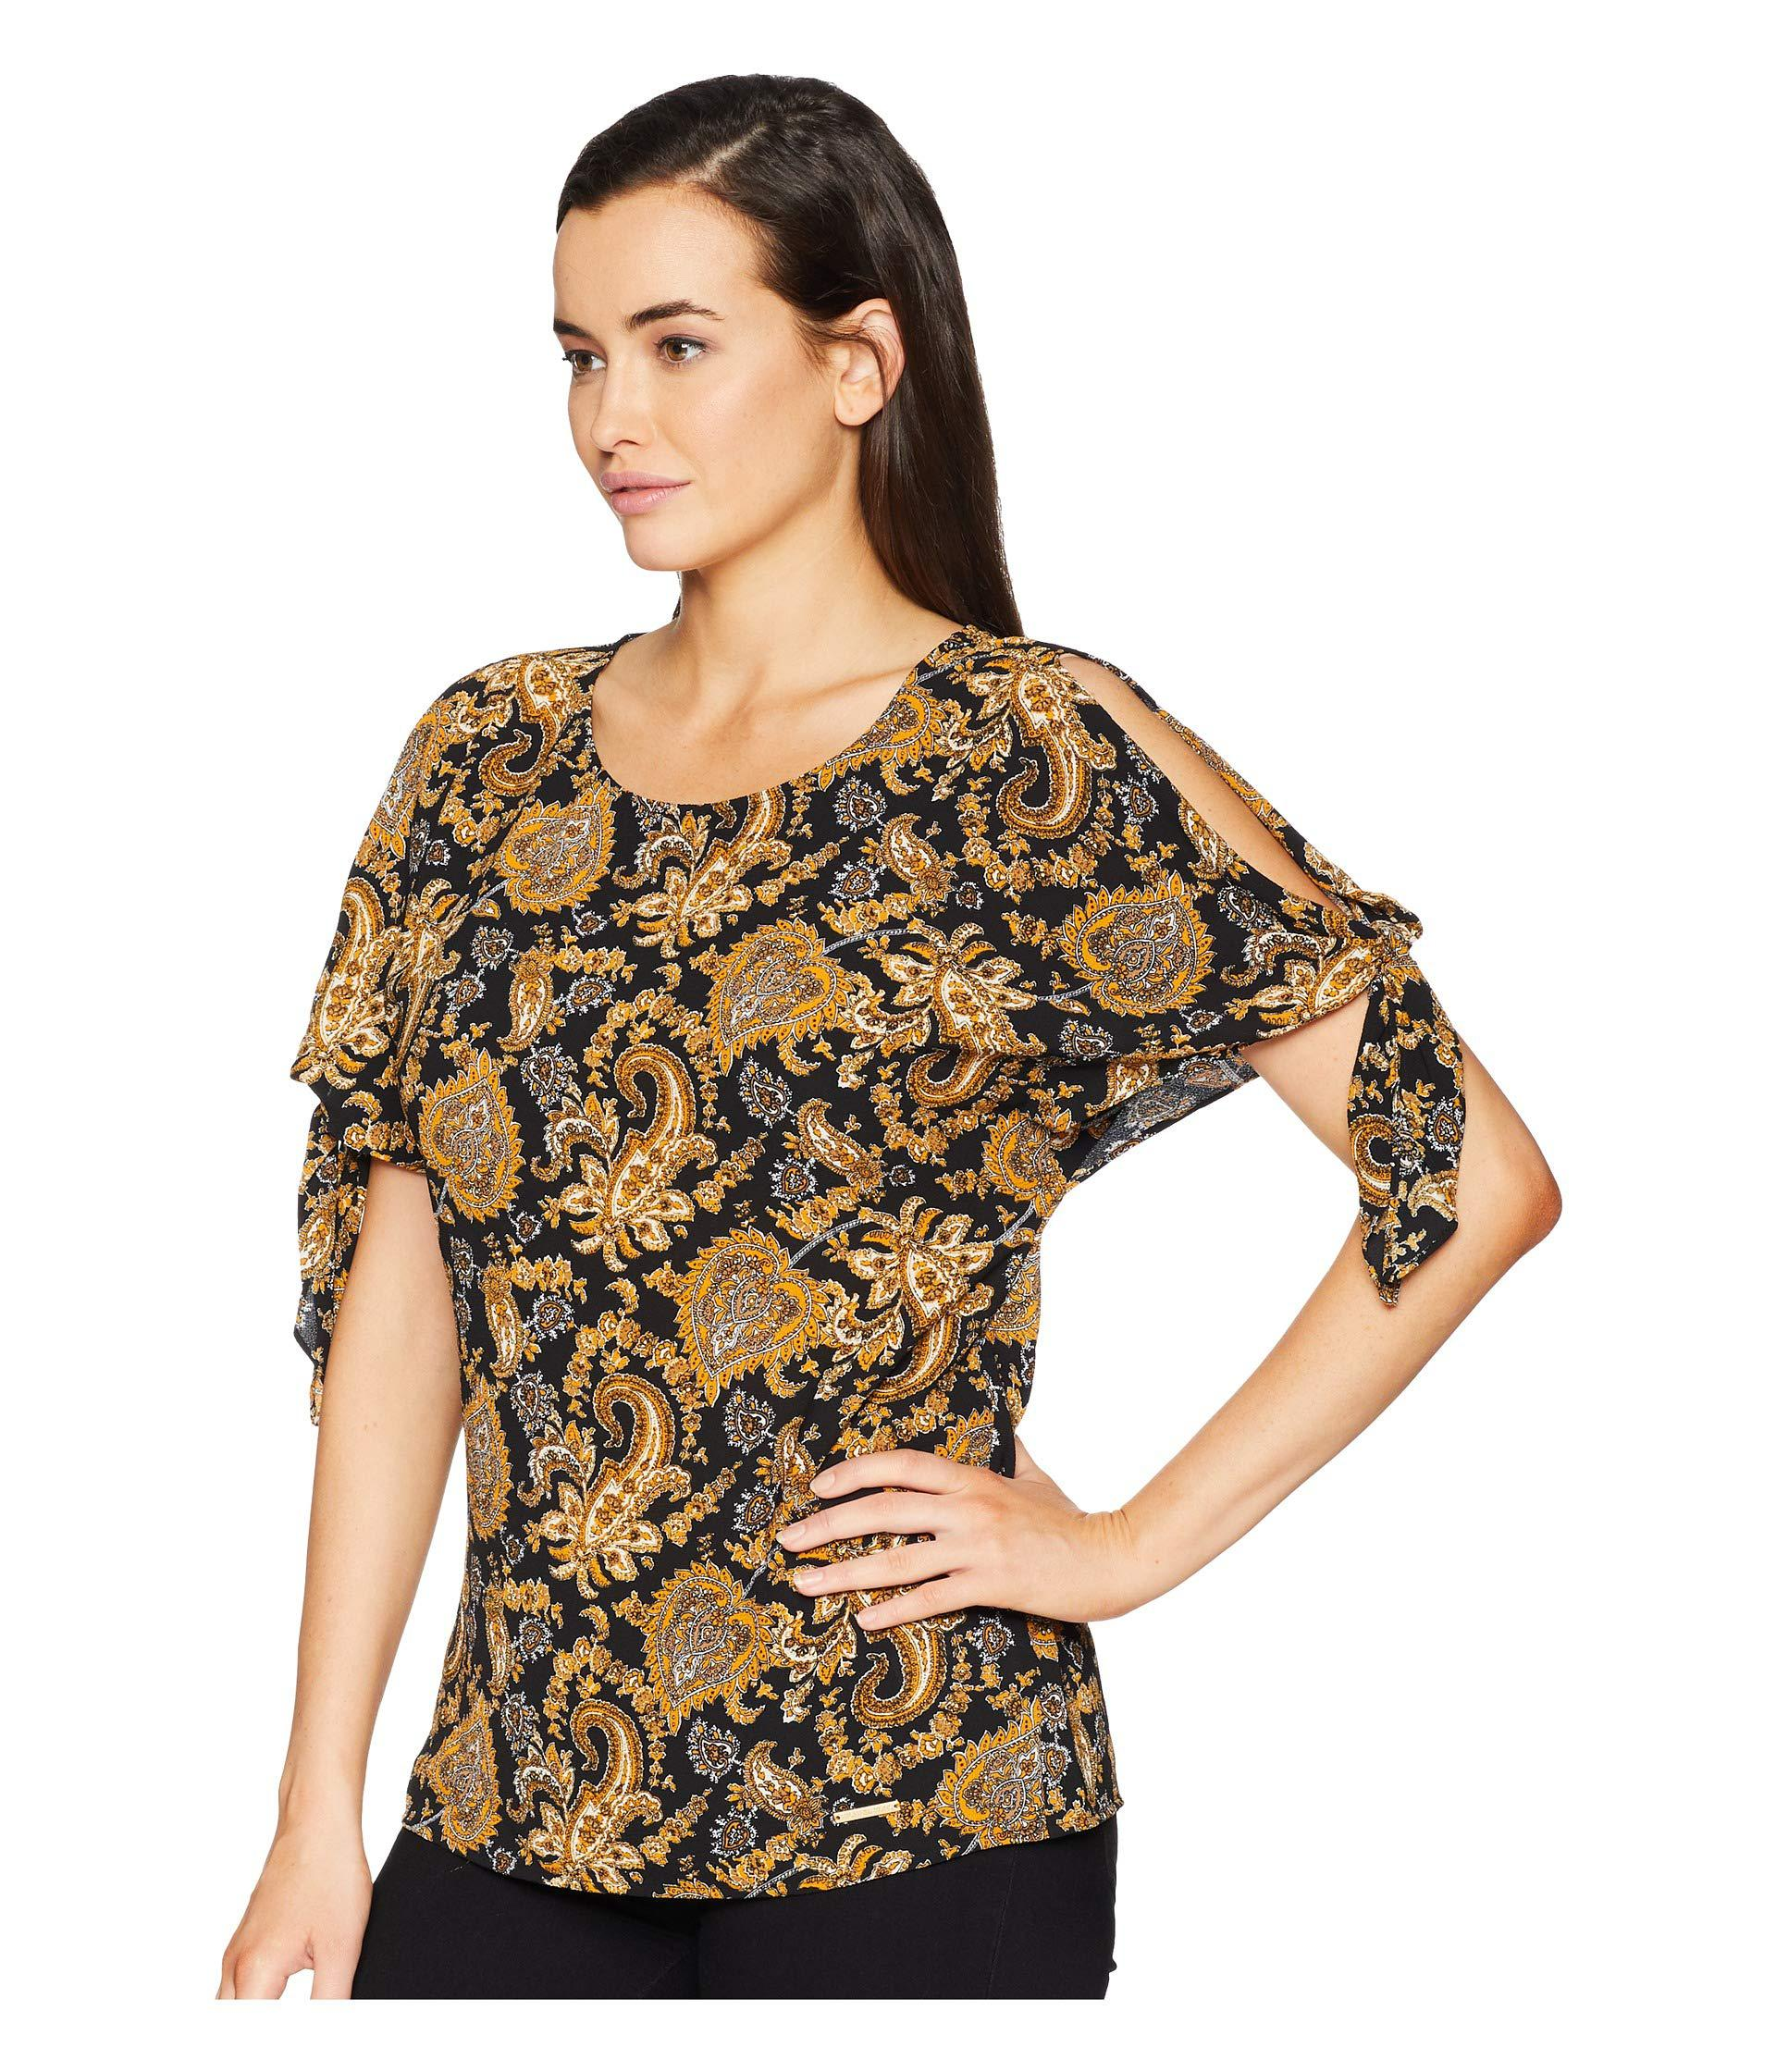 4b20a2d67b422 Lyst - Michael Michael Kors Plus Size Sweatheart Paisley Top  (black marigold) Women s Clothing in Black - Save 12%